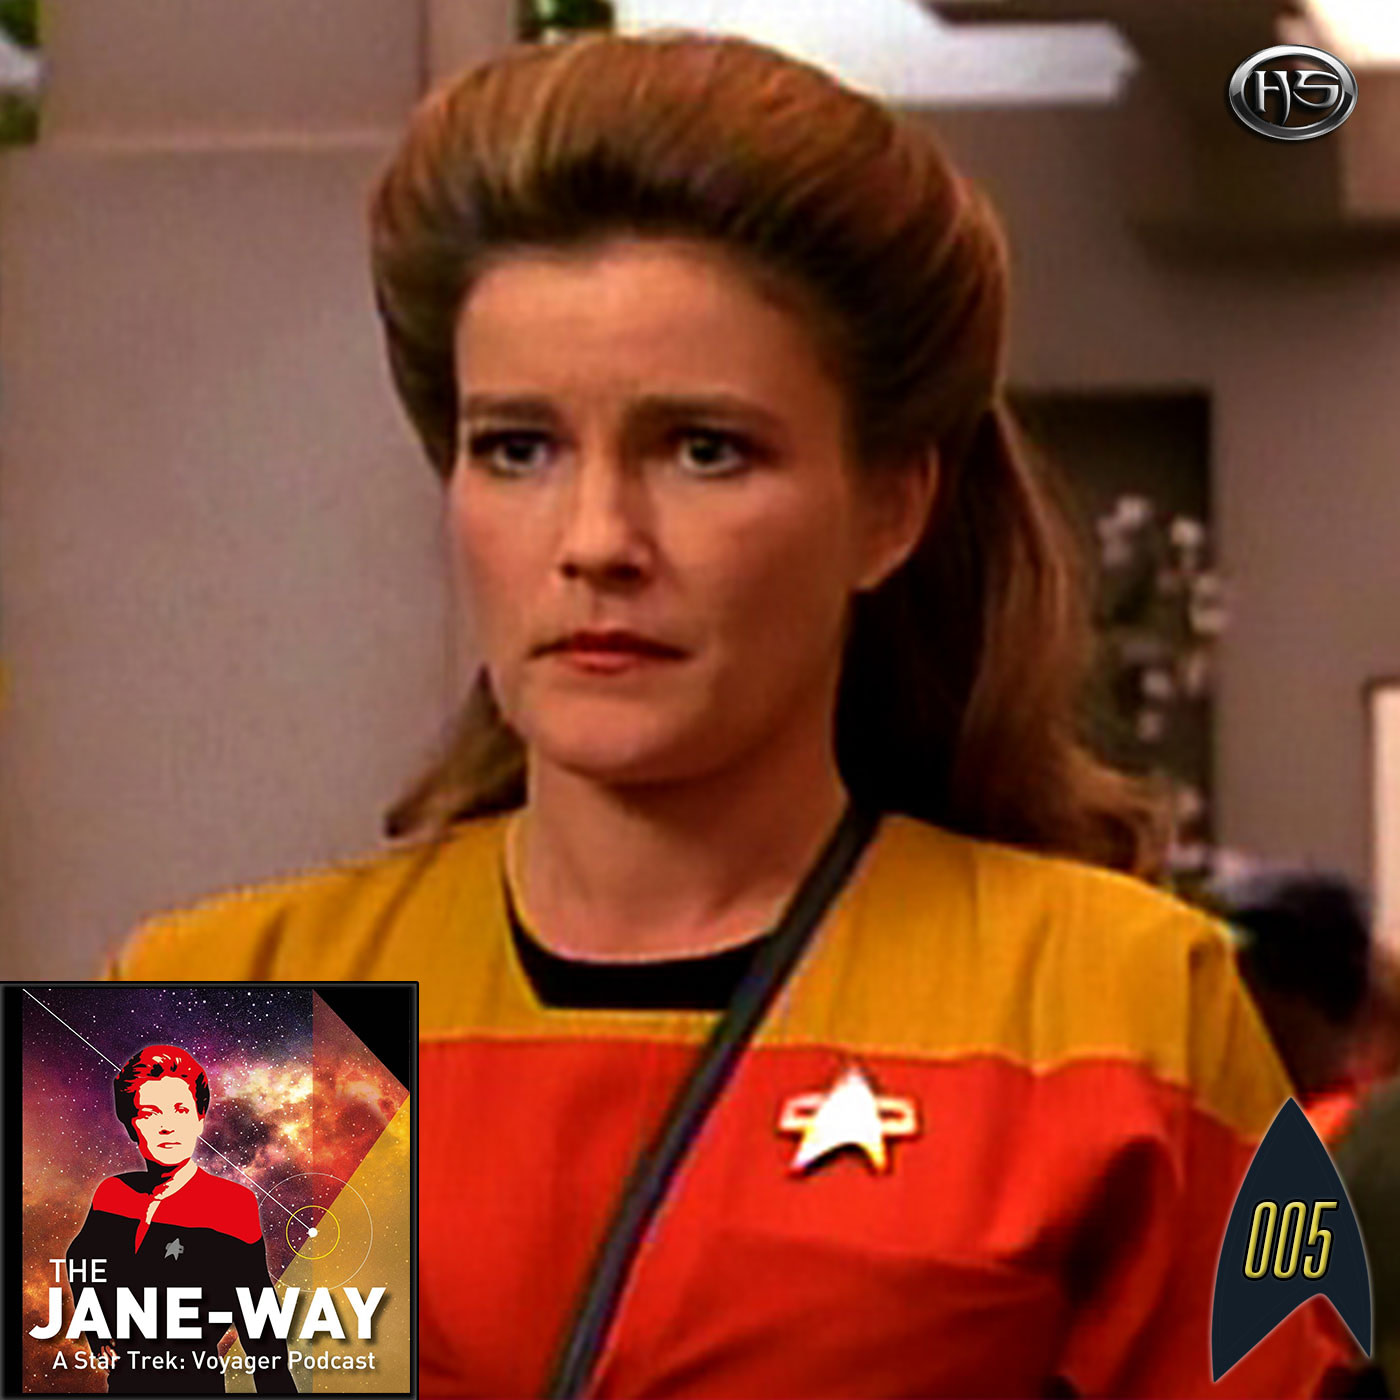 The Jane-Way Episode 5